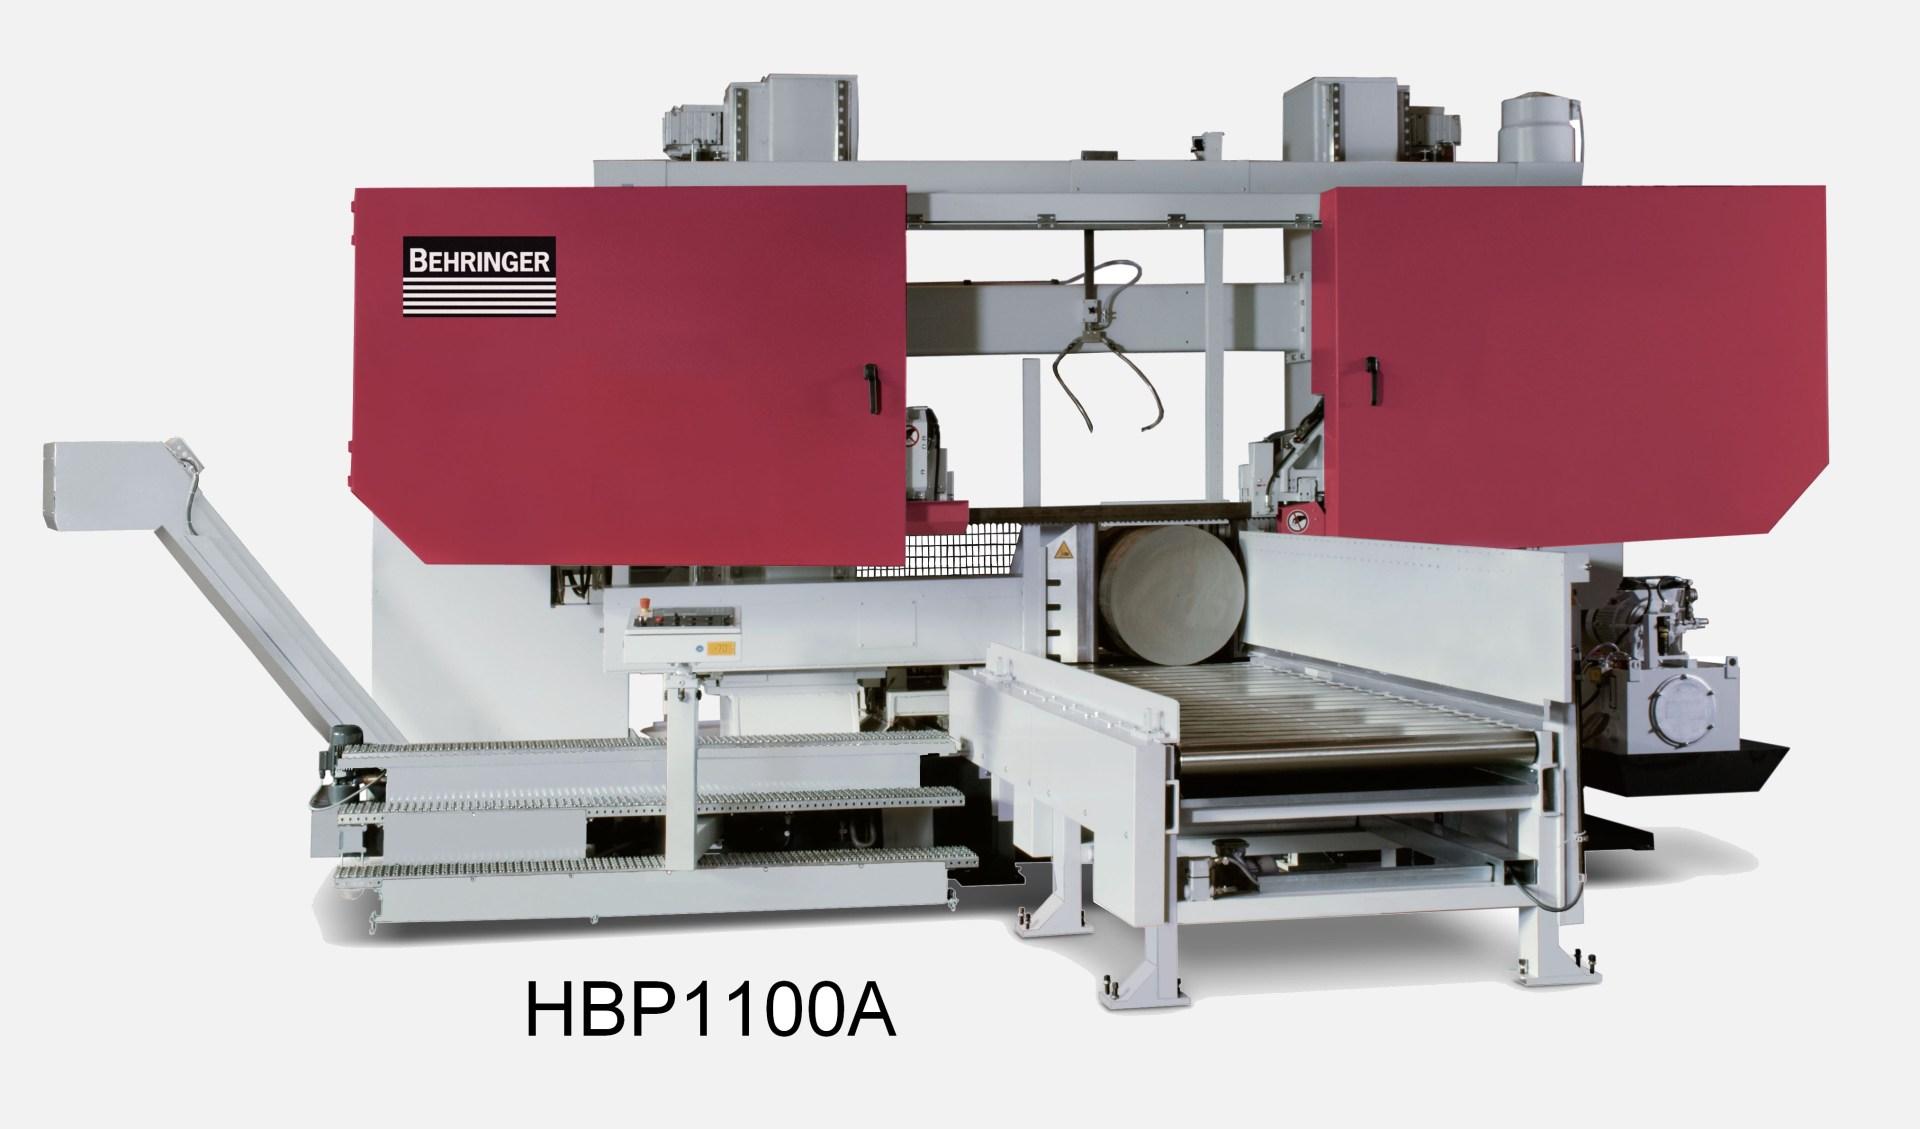 HBP1100A